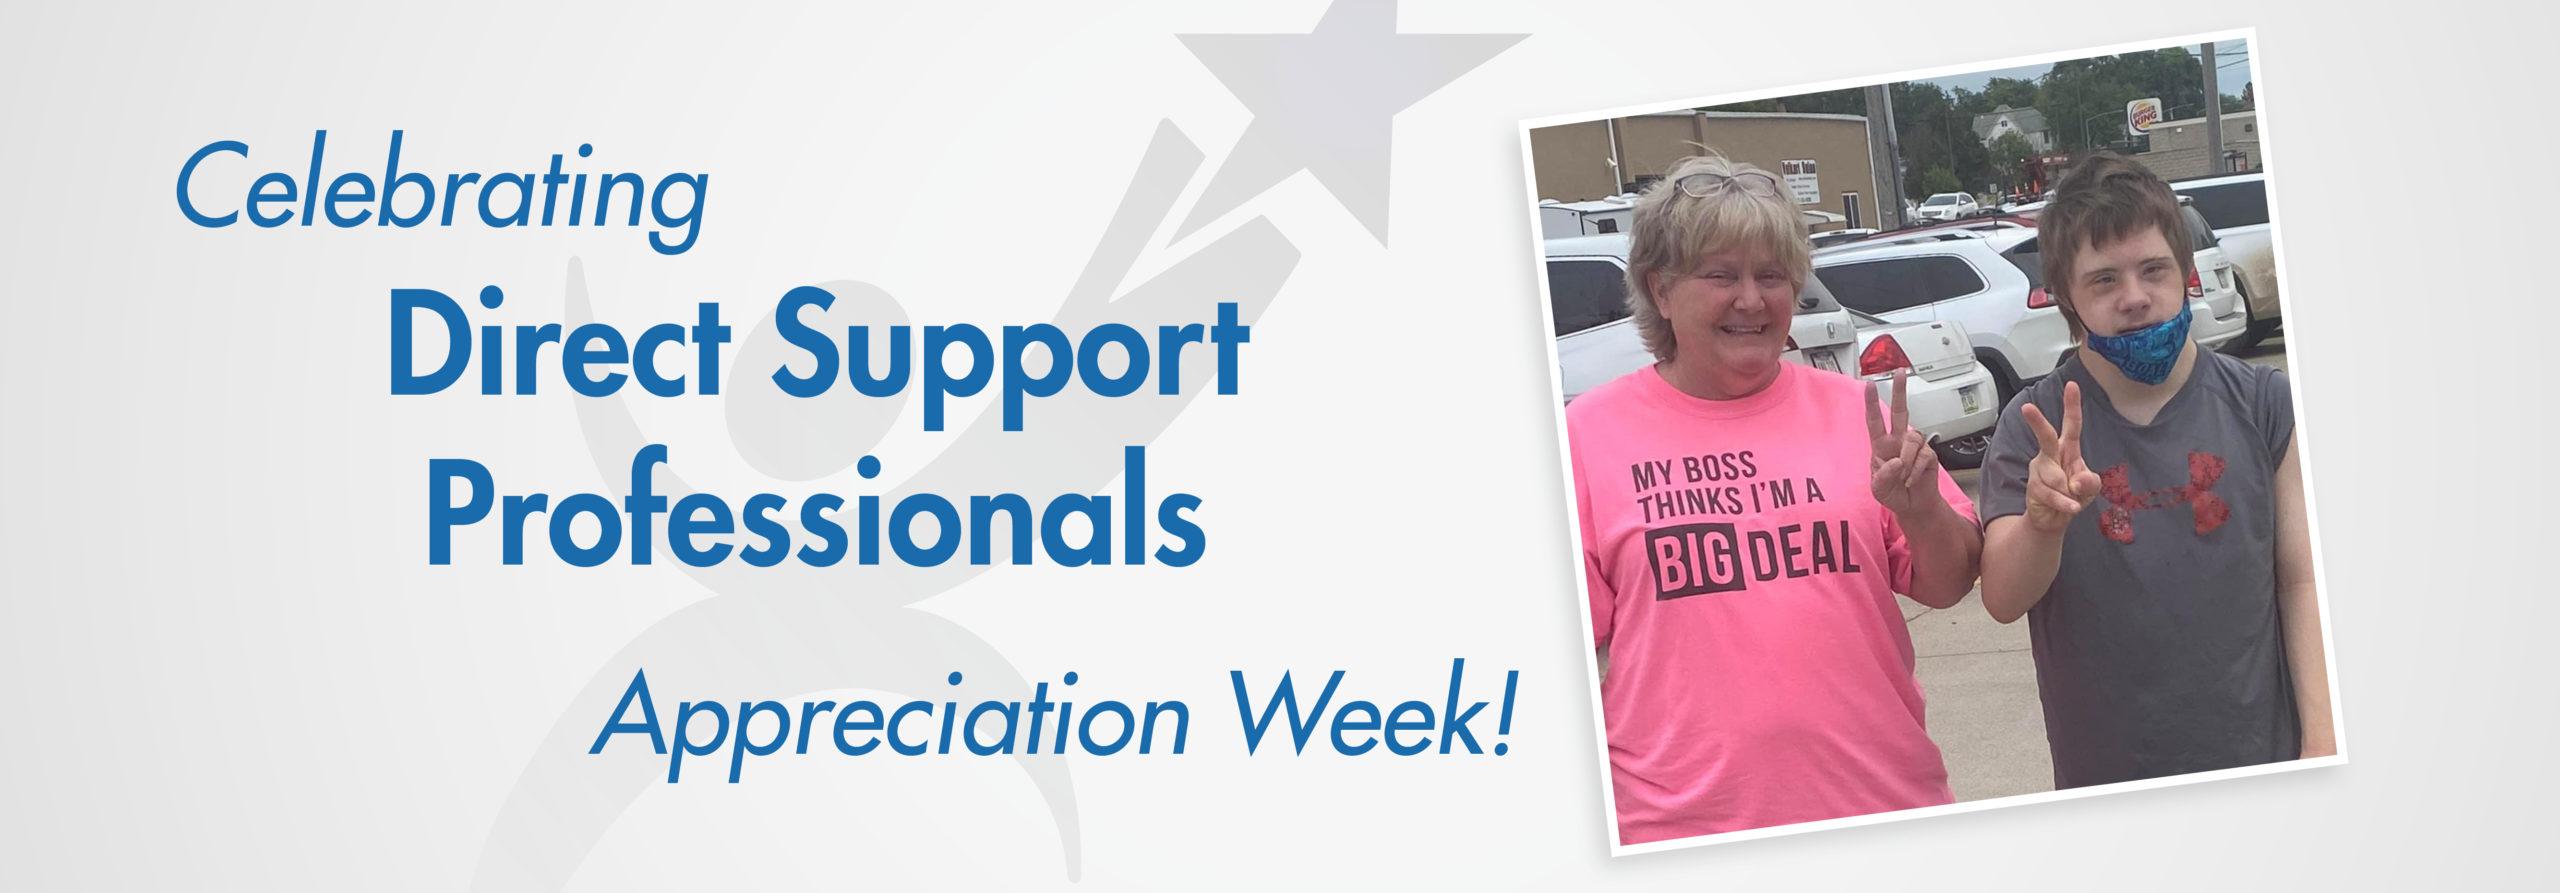 Celebrating Direct Support Professionals Appreciation Week!